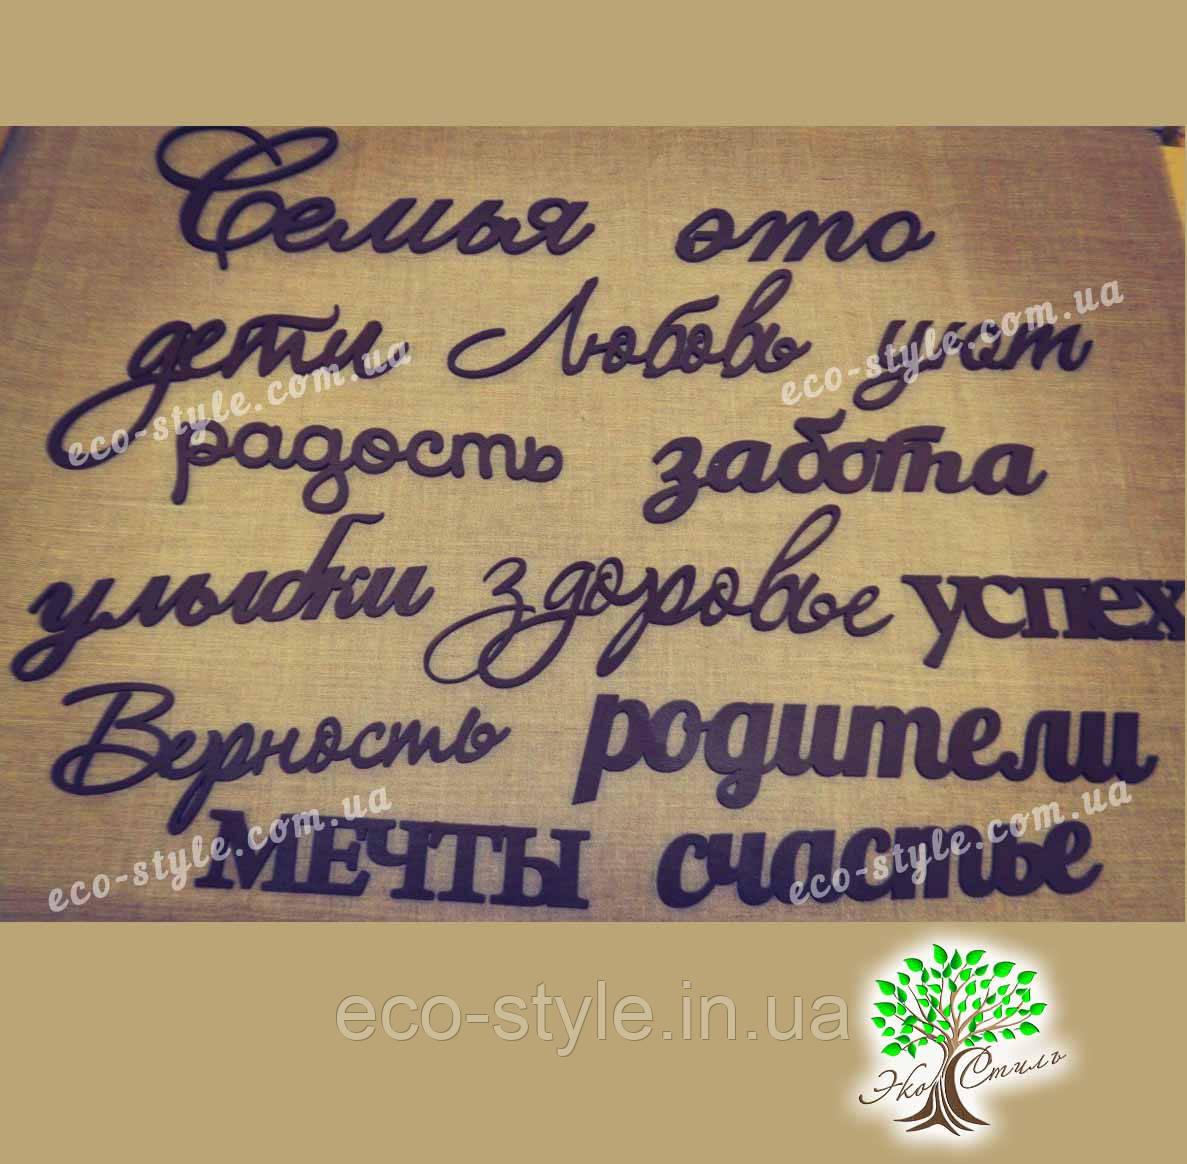 Слова из дерева, декоративные слова, деревянный декор для дома